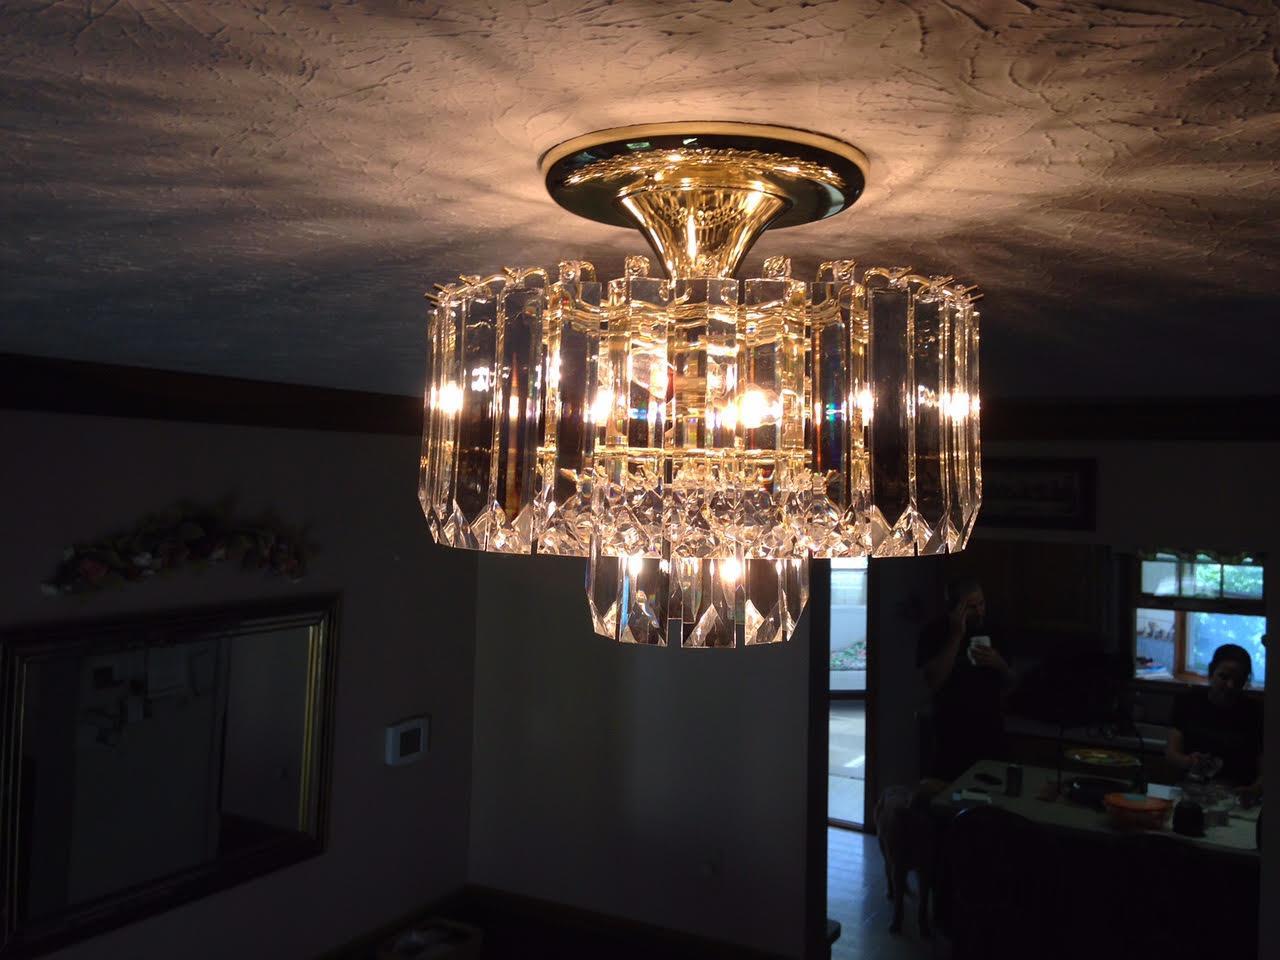 Chandelier Restoration After Fire Damage - Before Photo